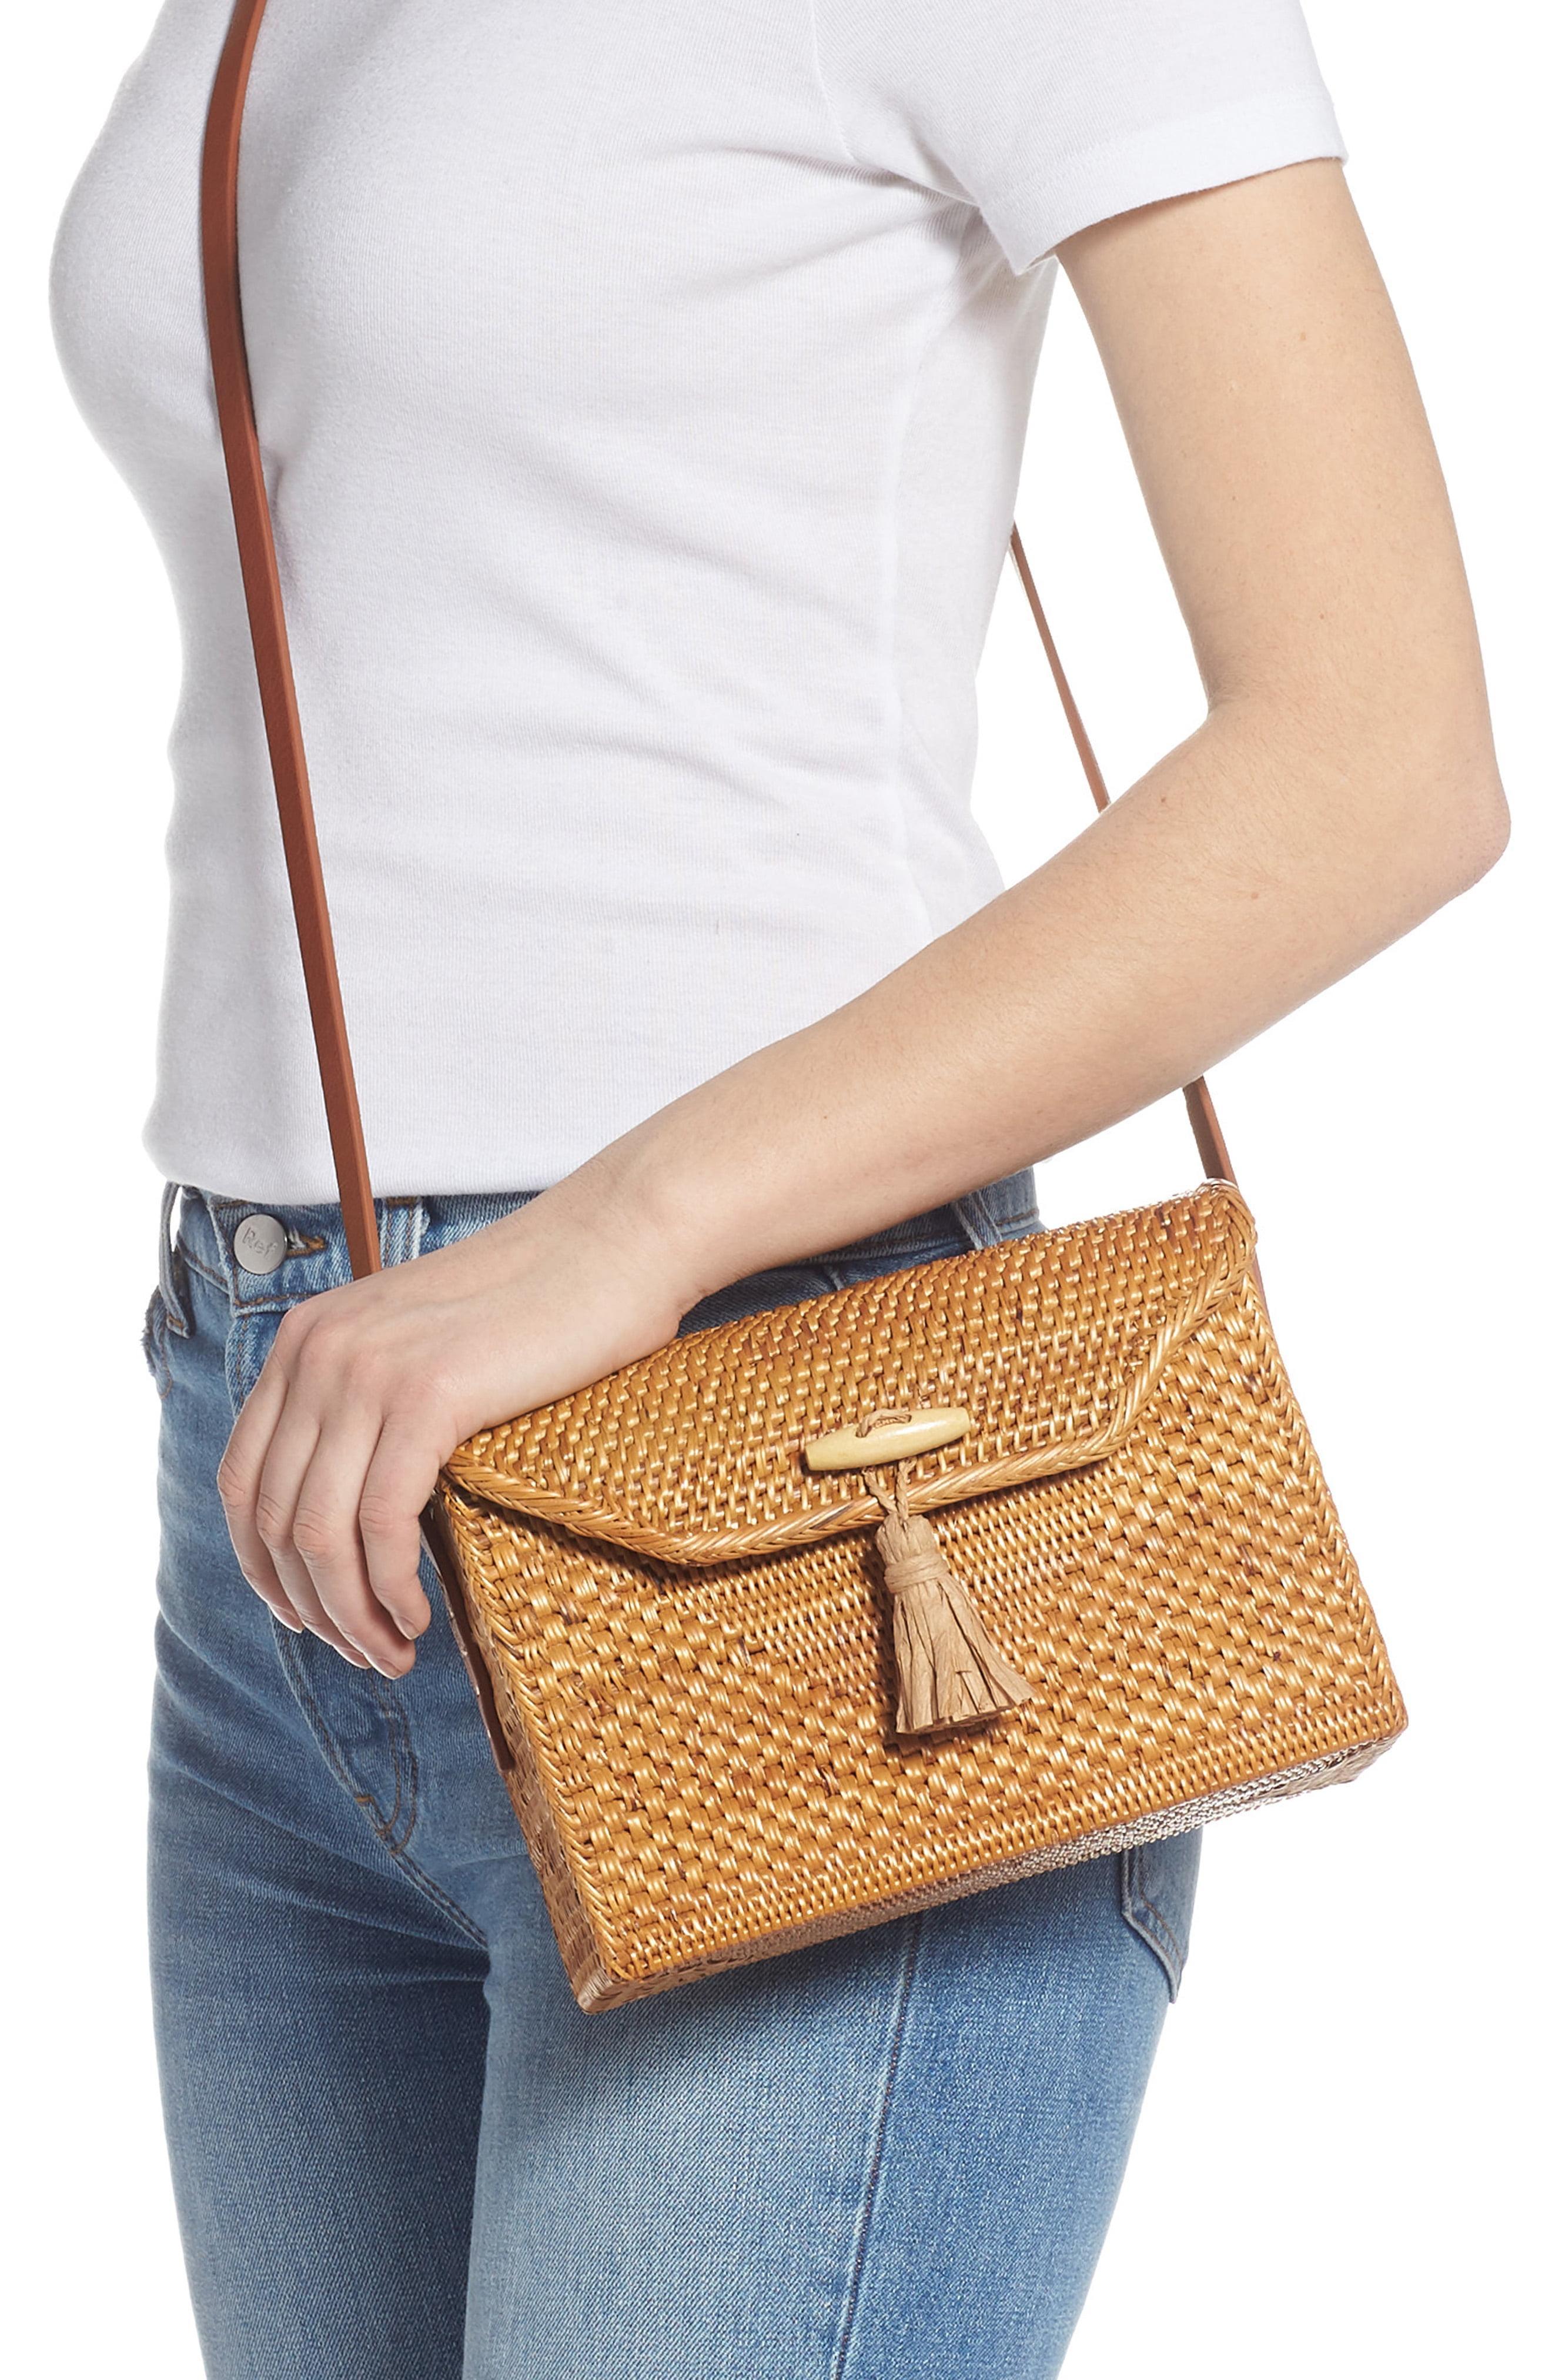 Nordstrom Designer Handbags Louis Vuitton